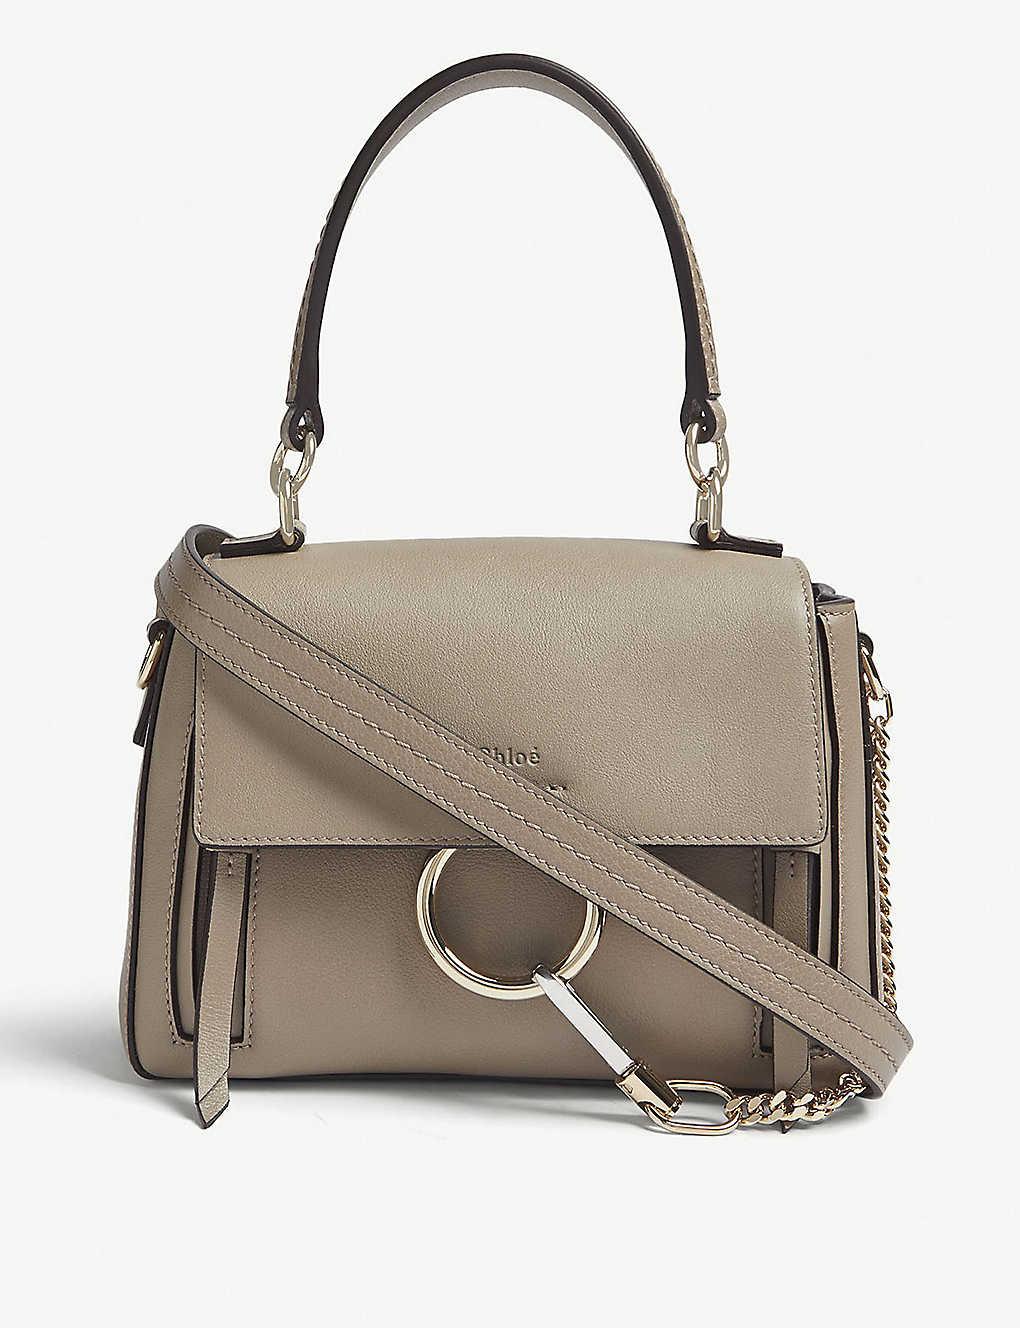 4535a07537 Faye Day mini leather shoulder bag